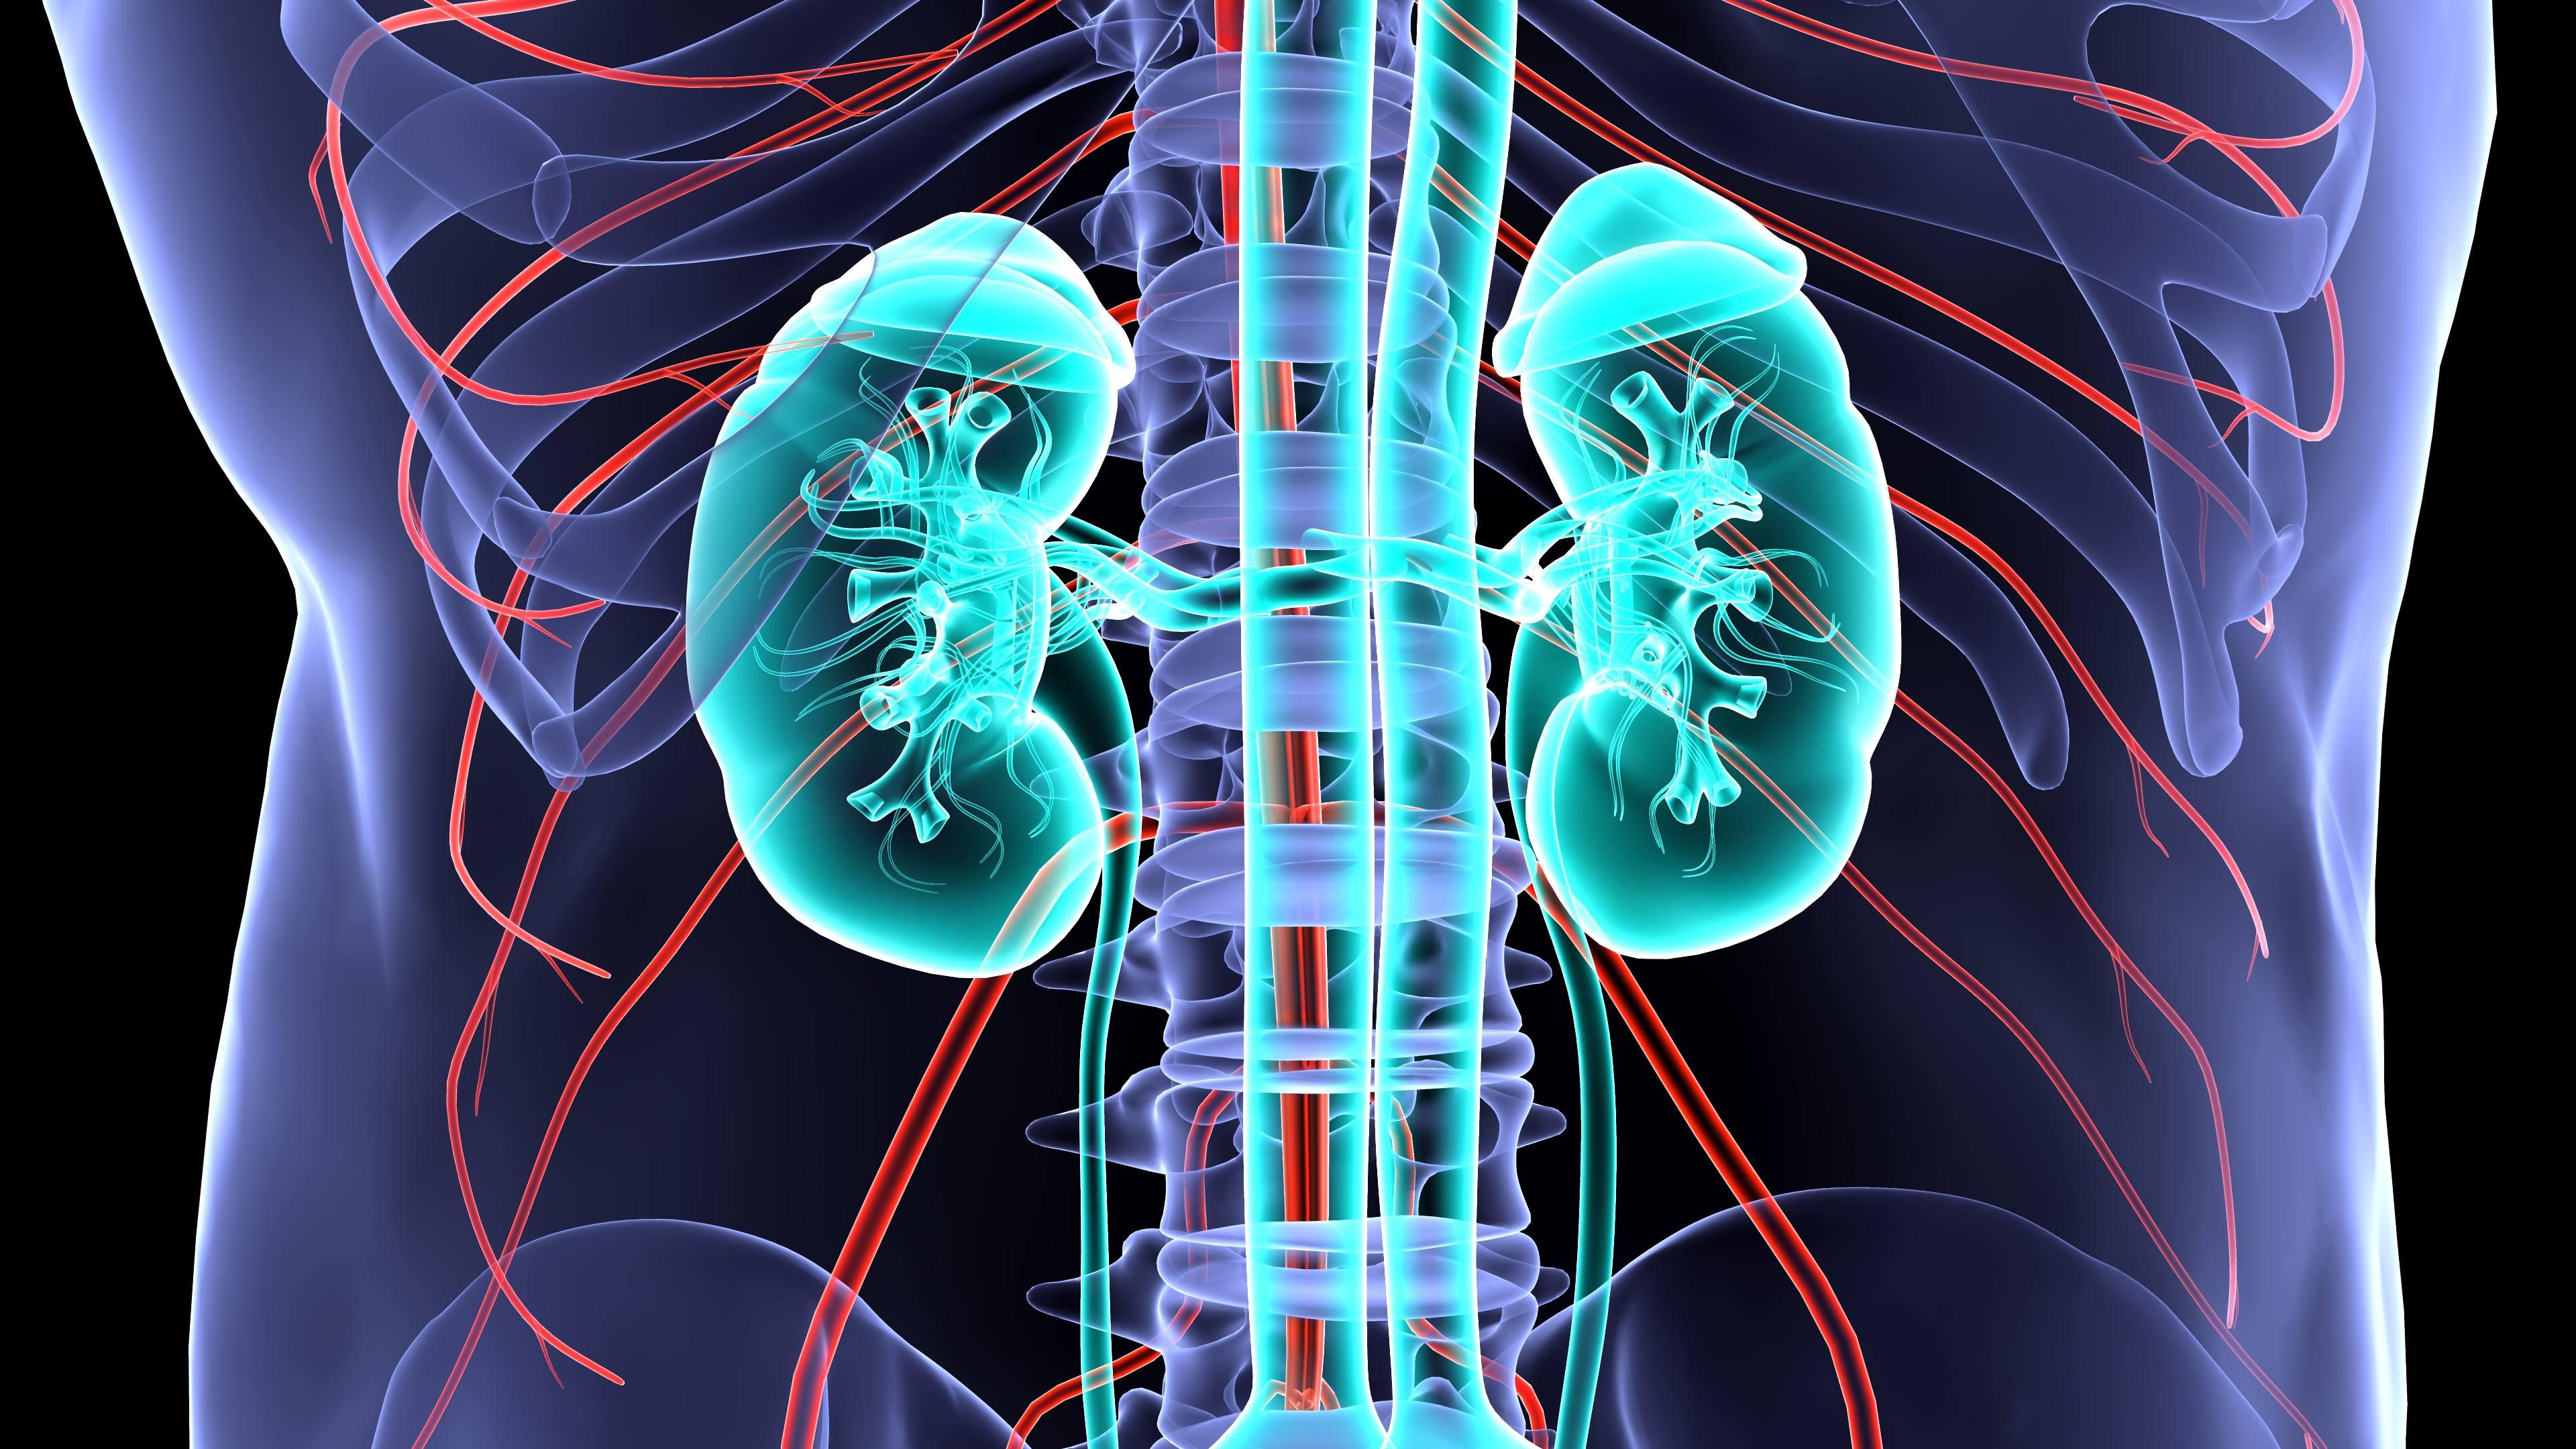 kidney anatomy.3d illustration